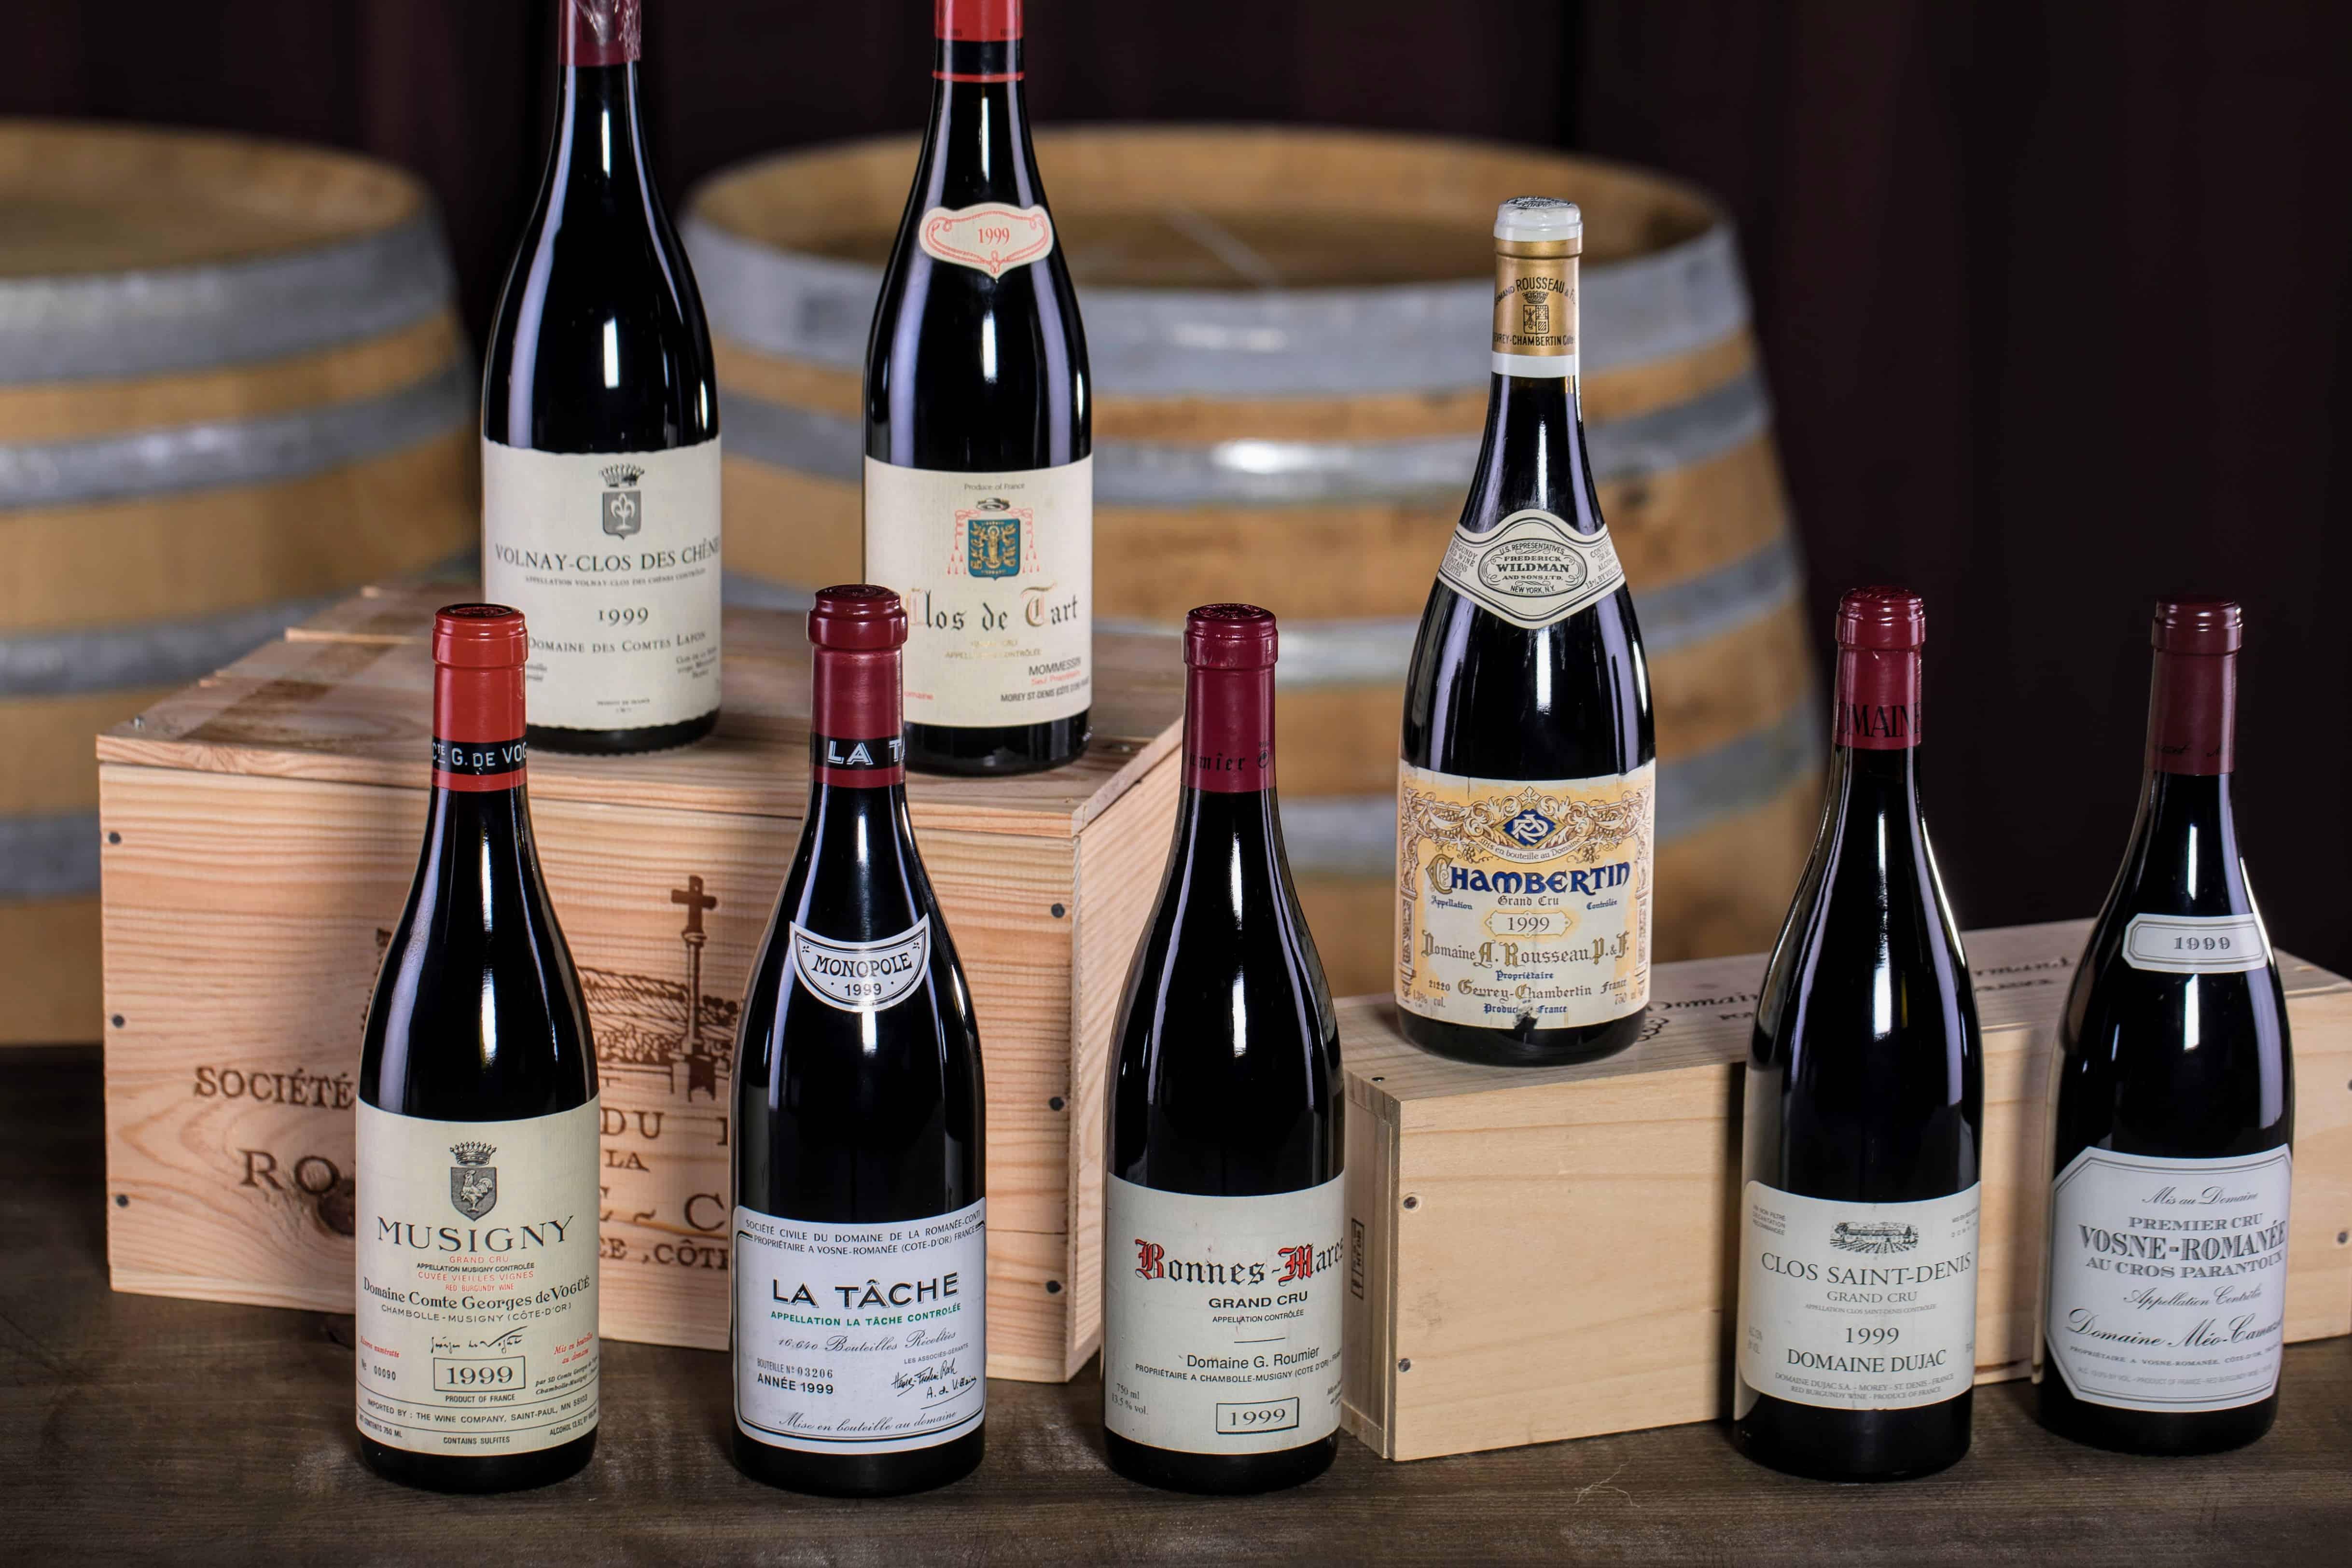 DRC and Clos de Tart make some of the best grand cru Burgundy.